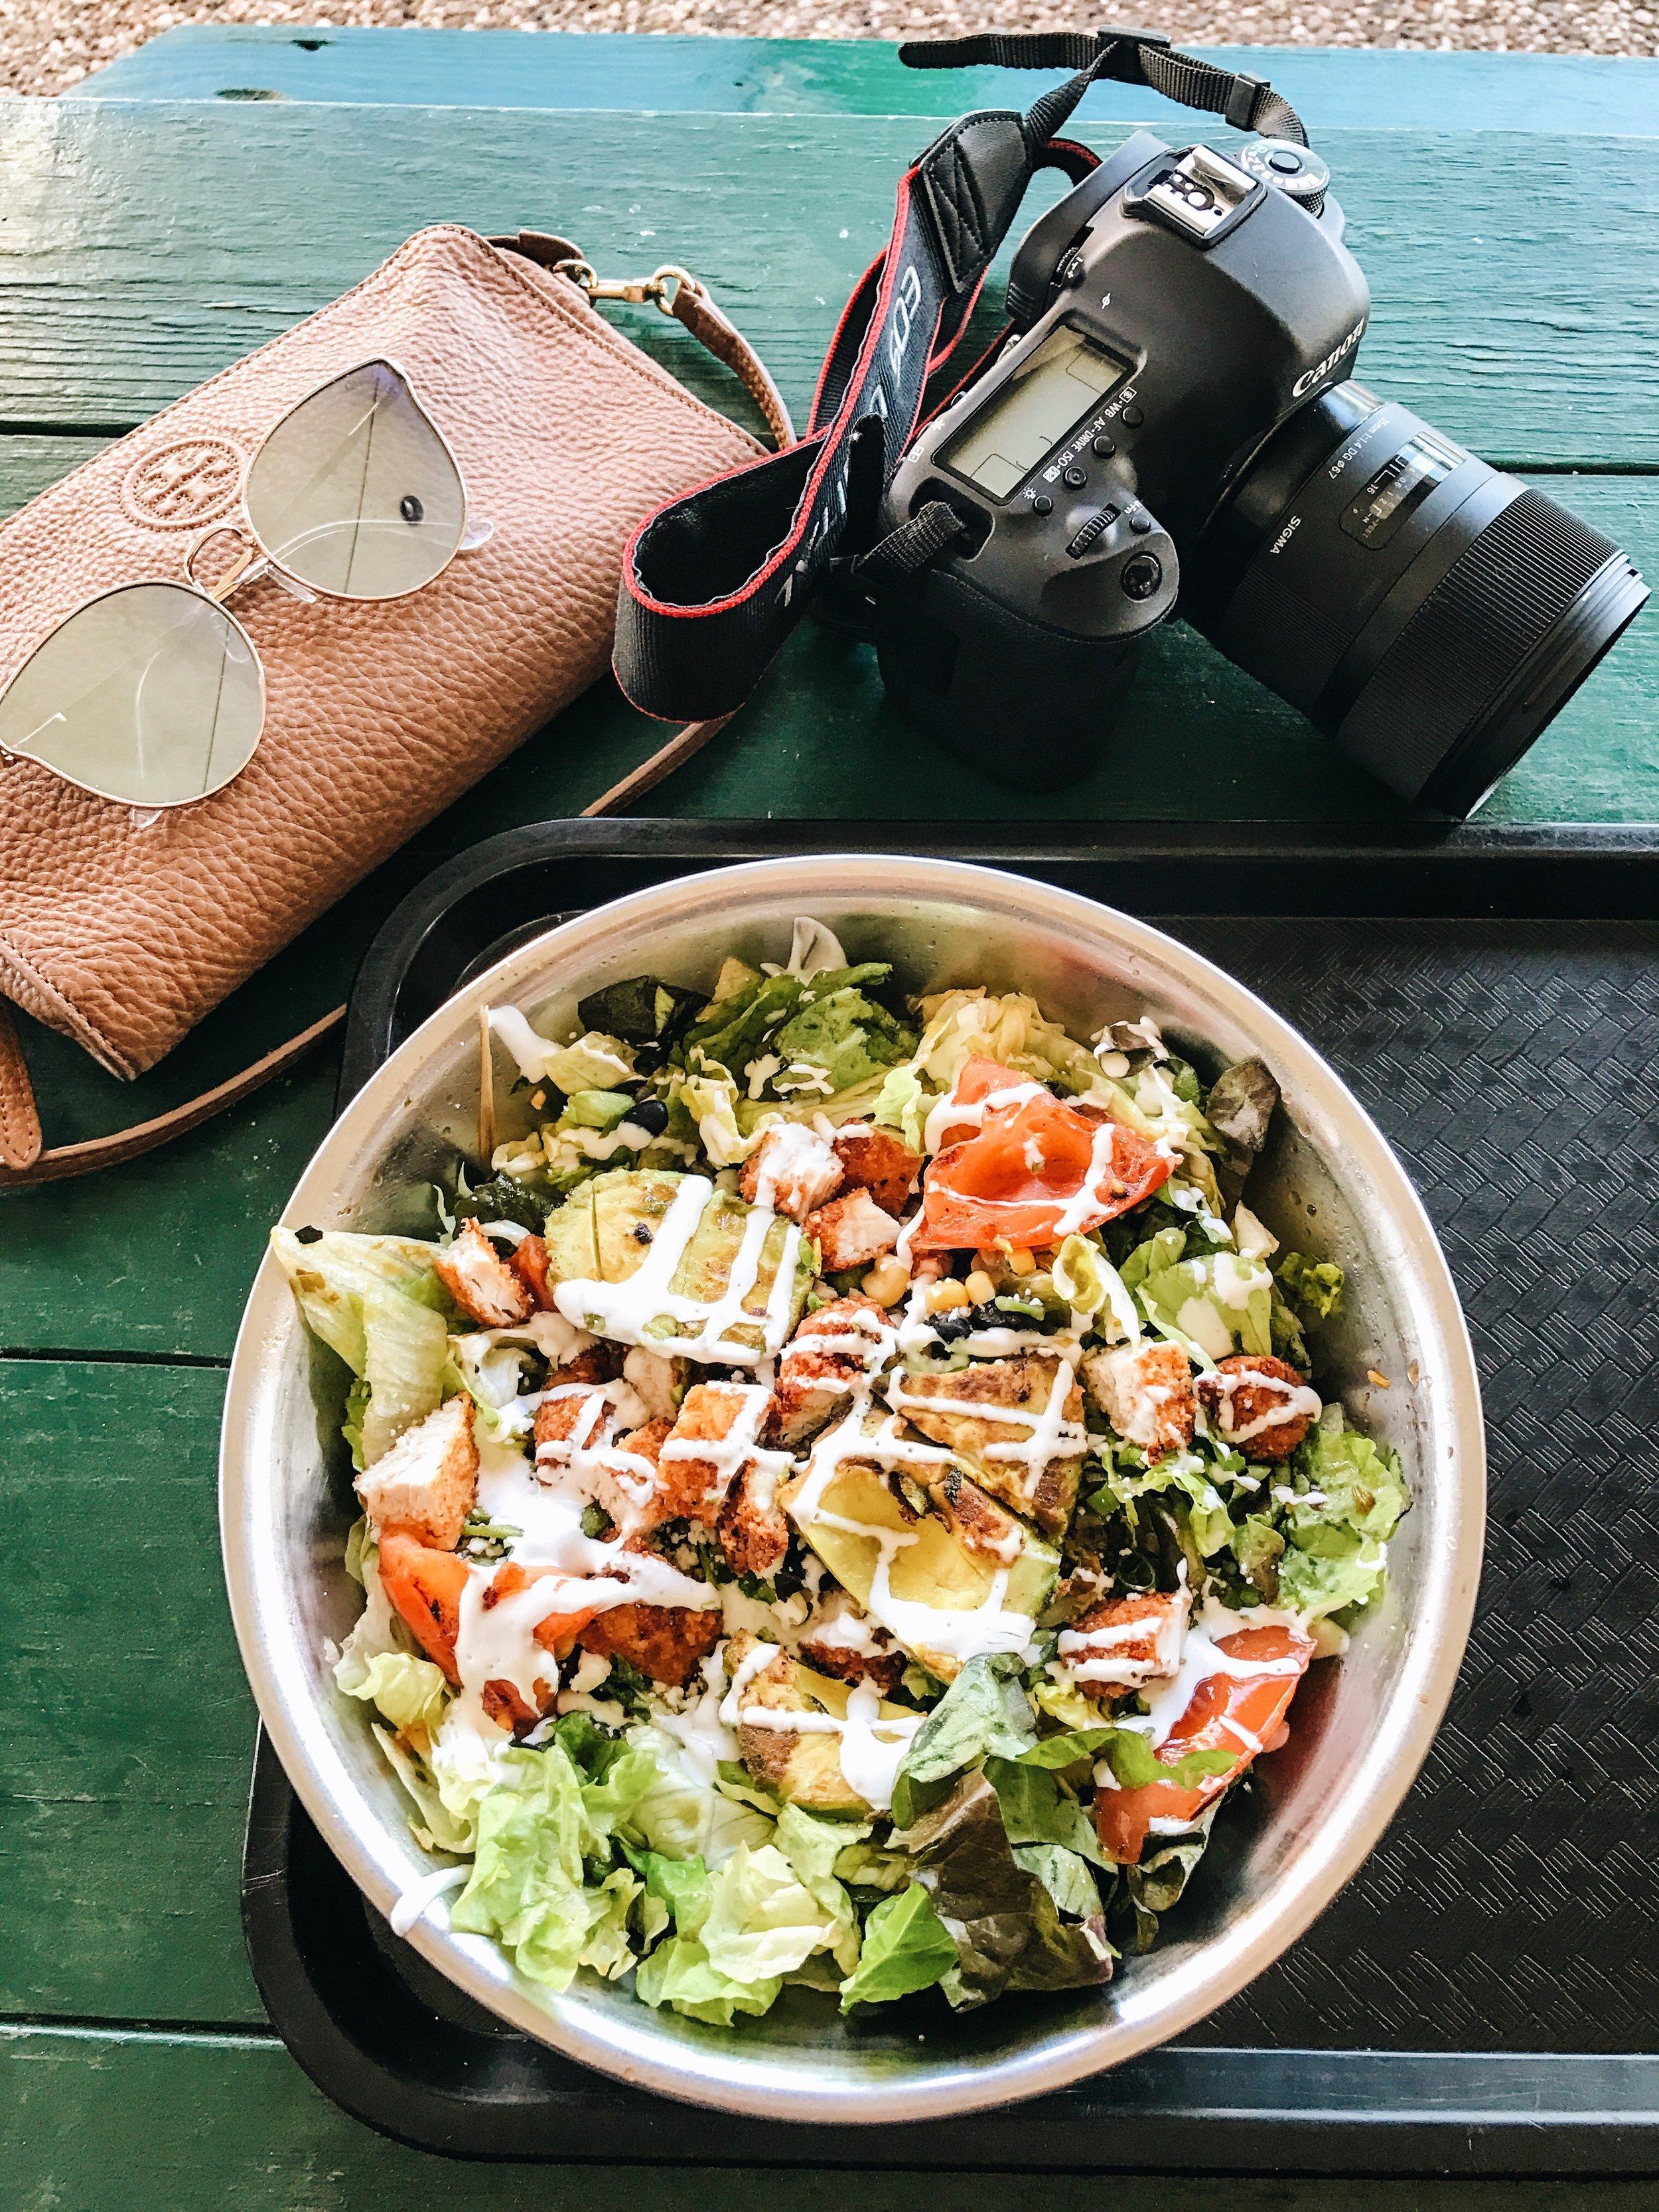 Snappy Salads - Grilled Avocado w/ Crunchy Chicken